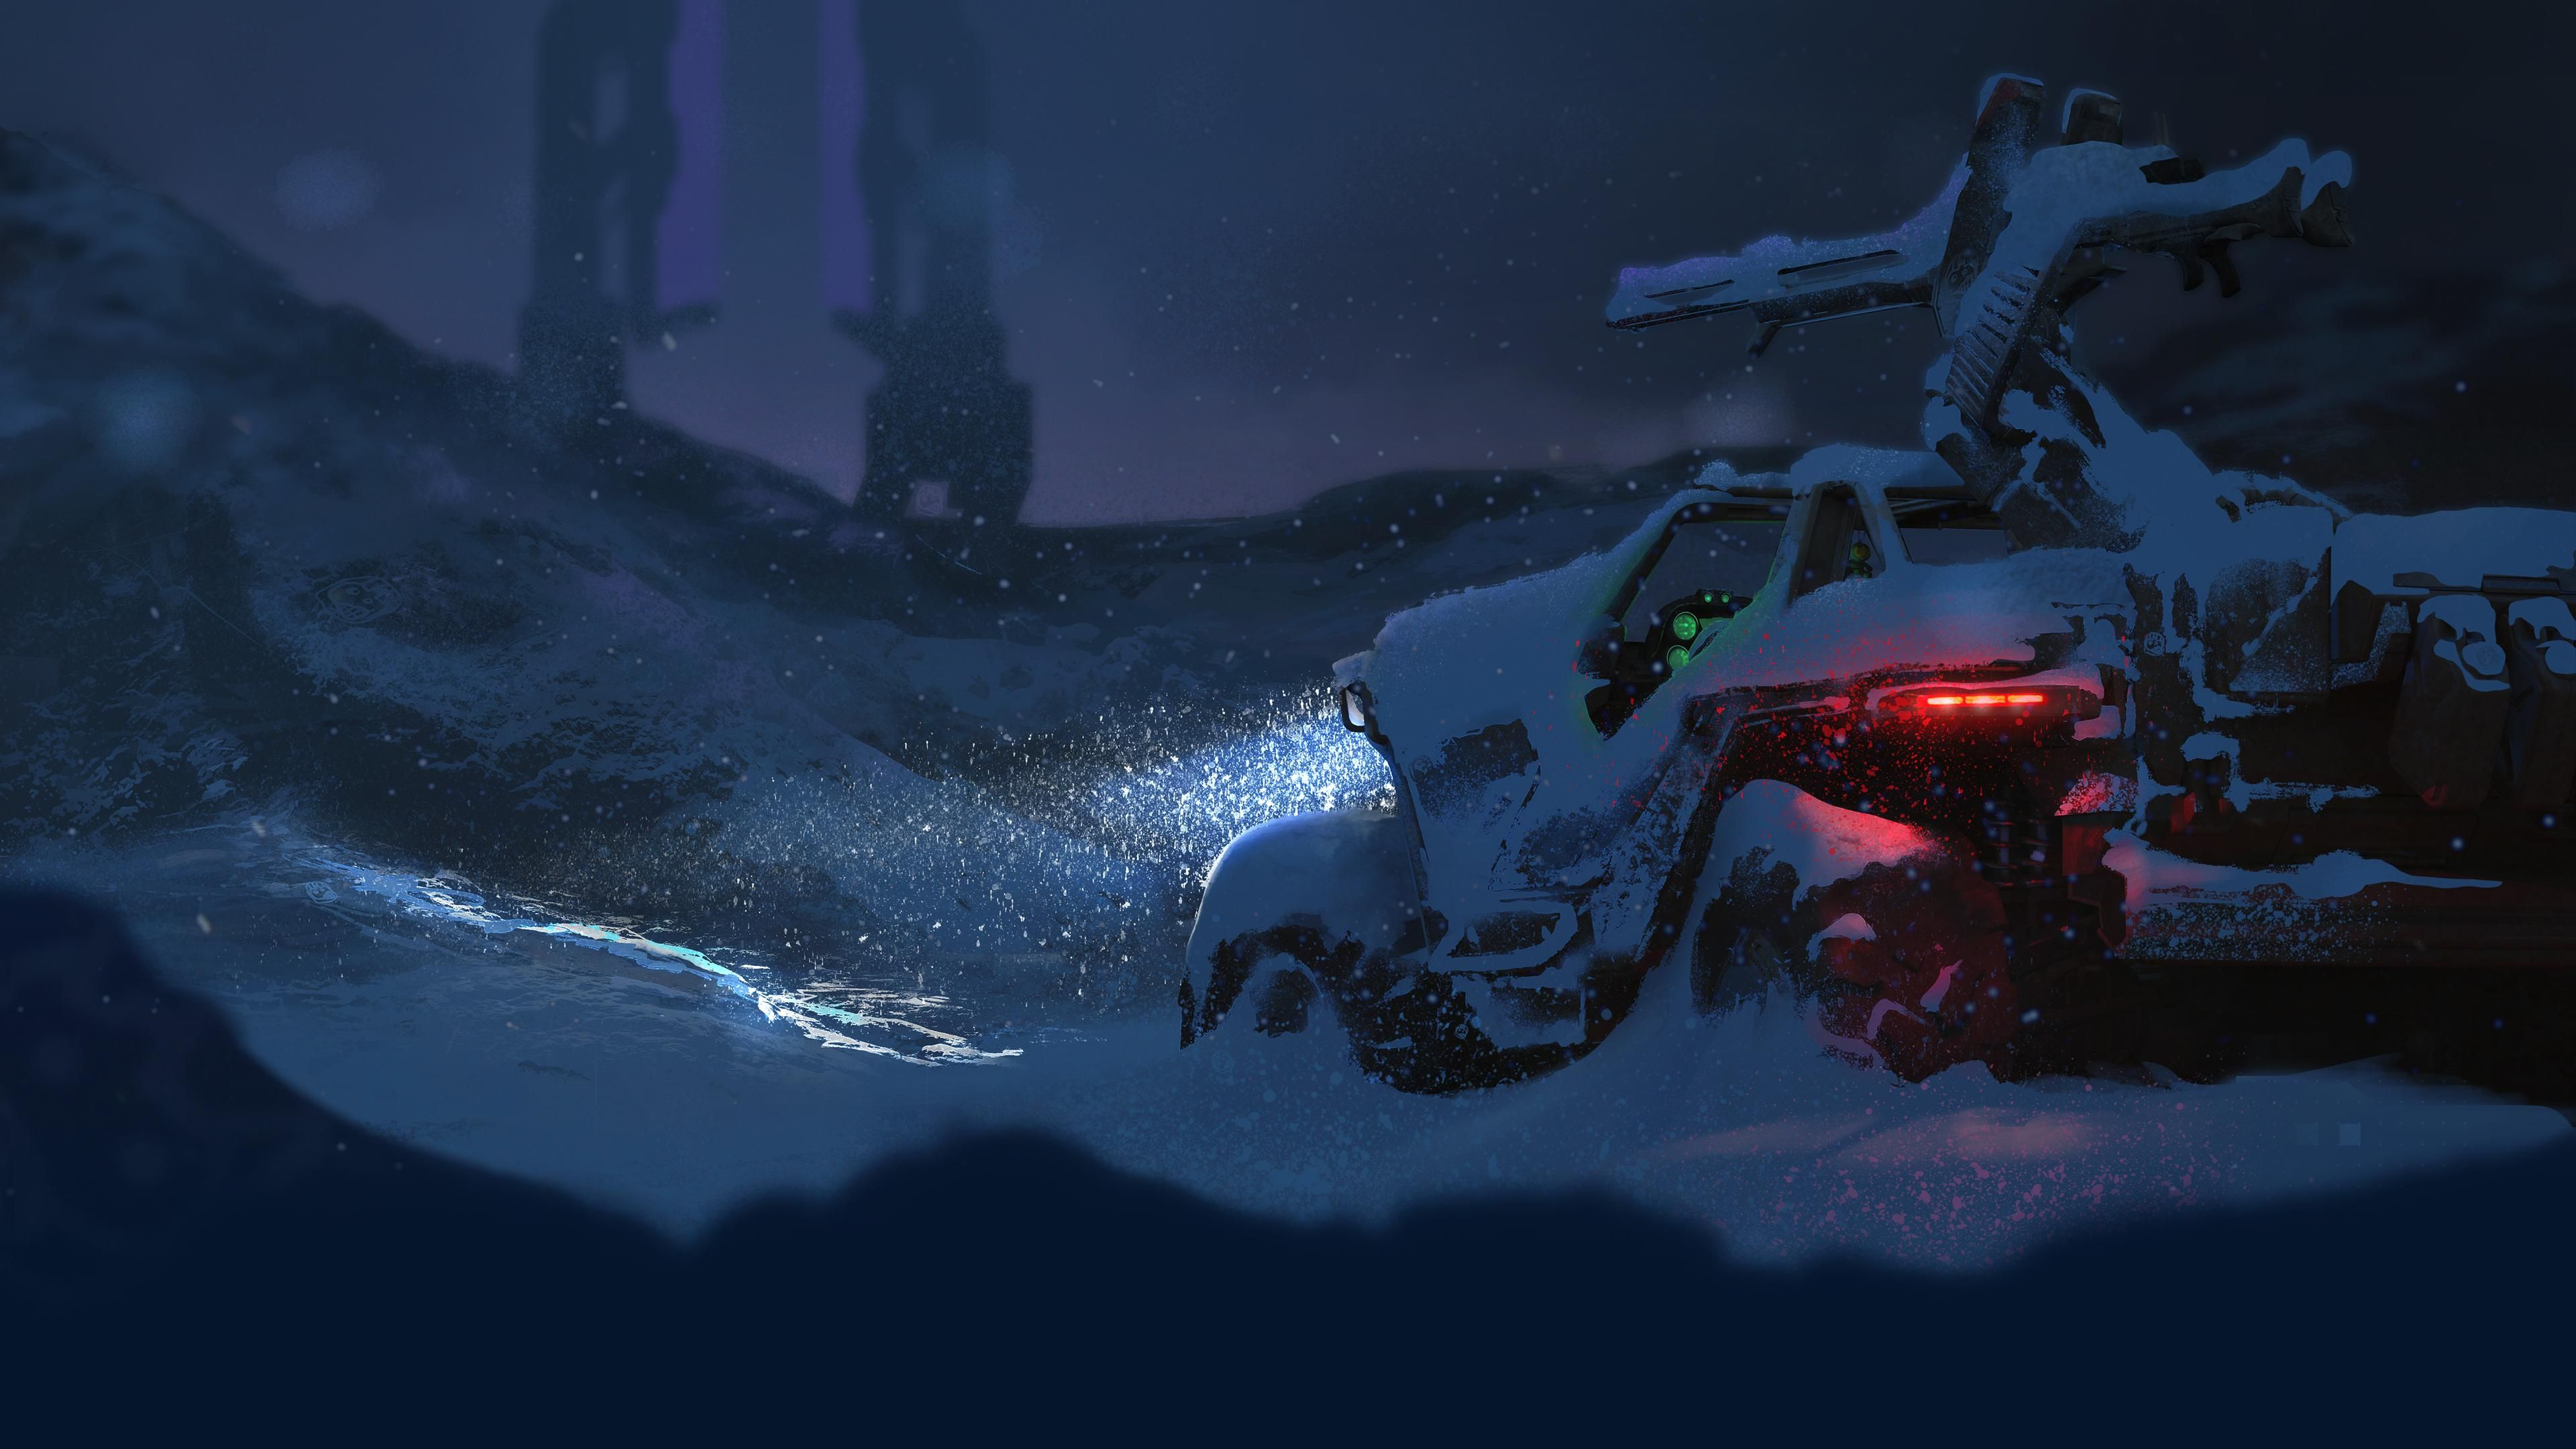 Halo Warthog In Snow 3840x2160 Halo Warthog Halo Wallpaper